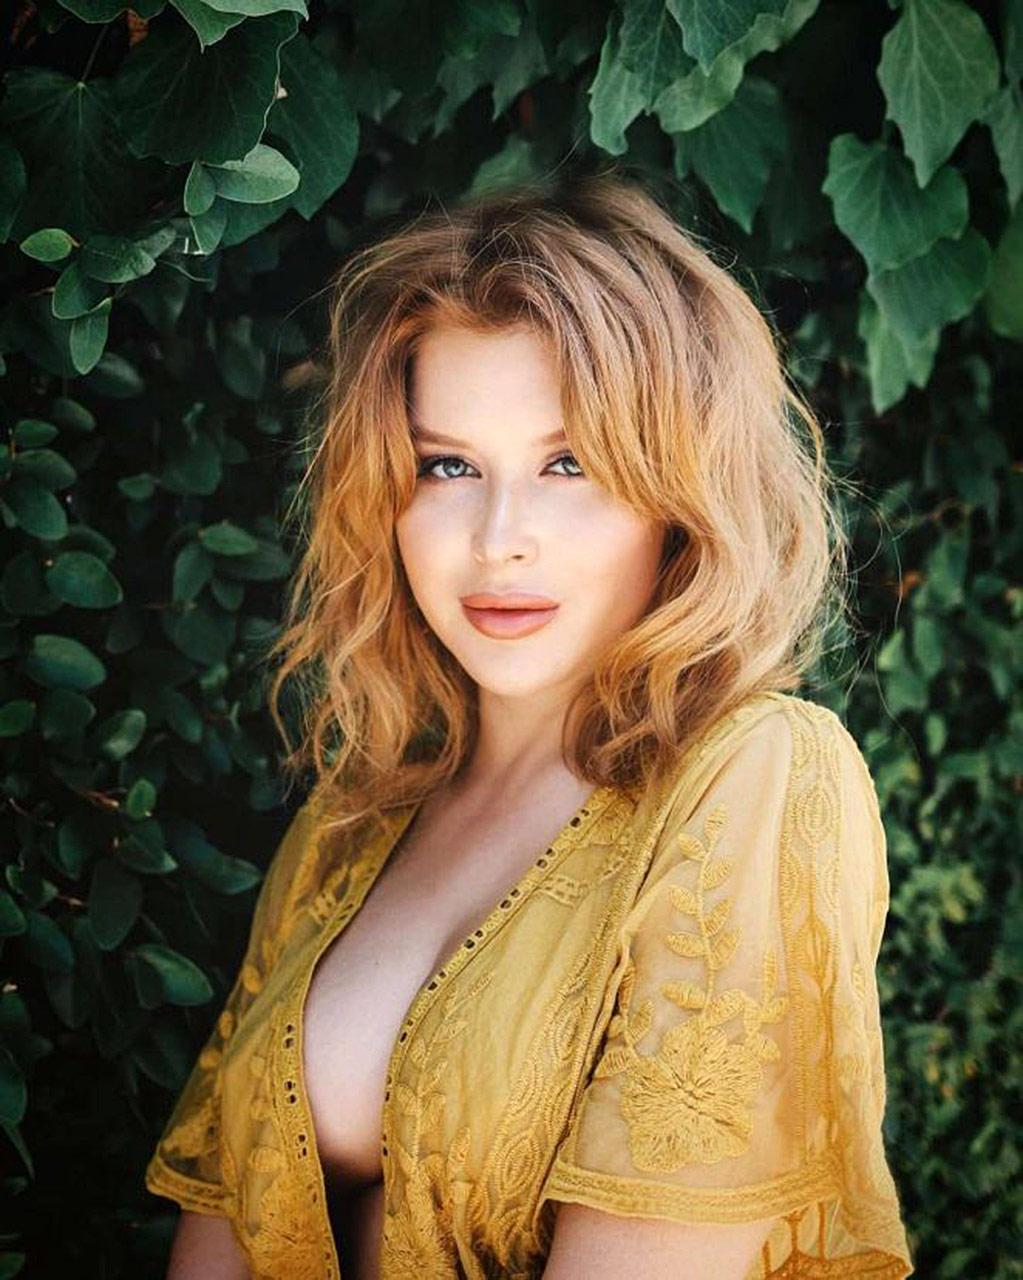 Beautiful nude babe pics